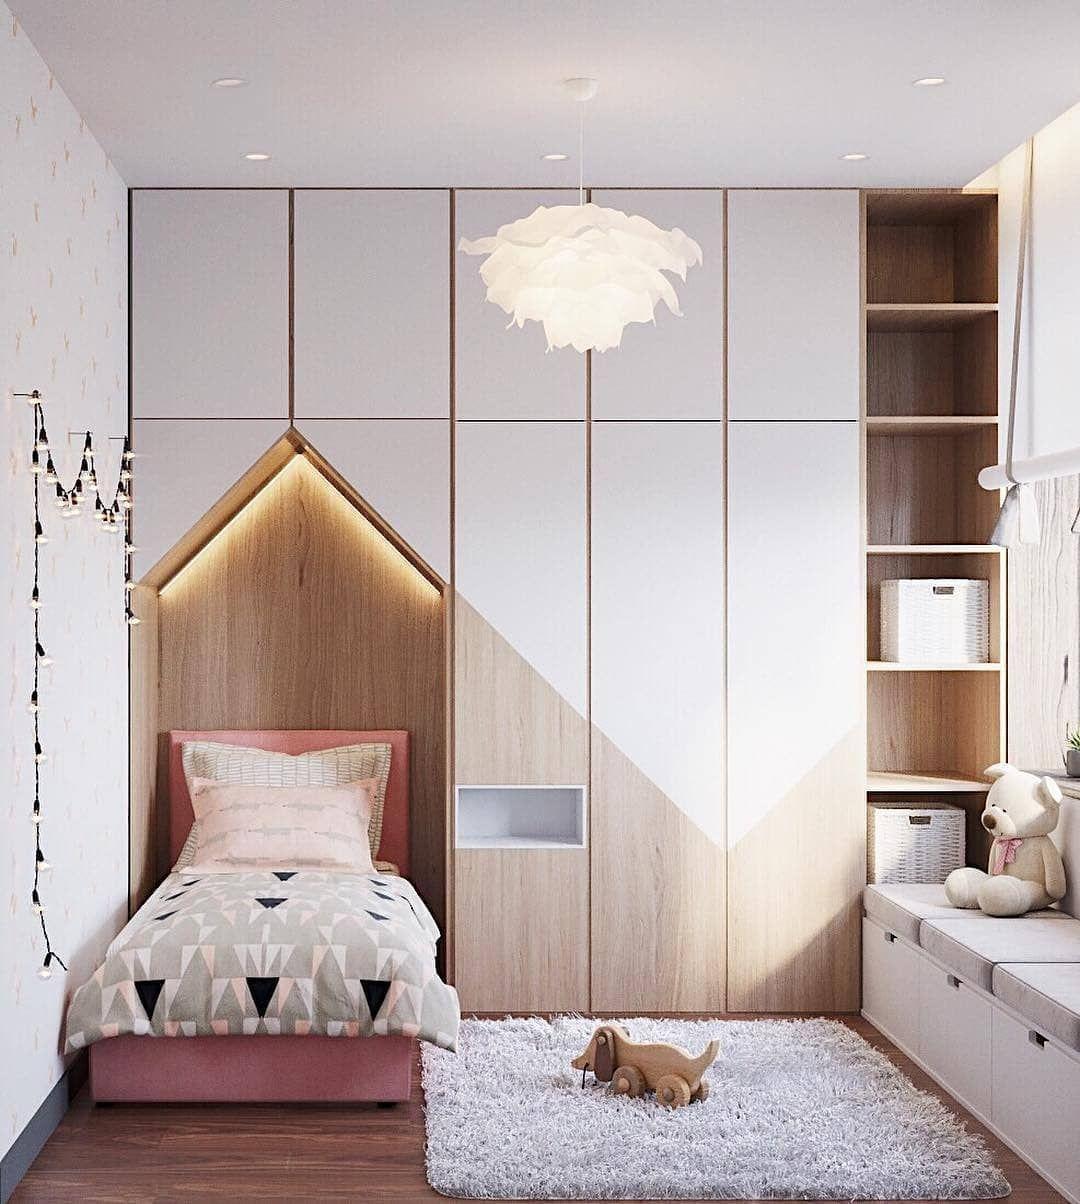 30 Mind Blowing Small Bedroom Decorating Ideas: 27++ Inspairing Amazing Kids Bedroom Design Ideas (Mind